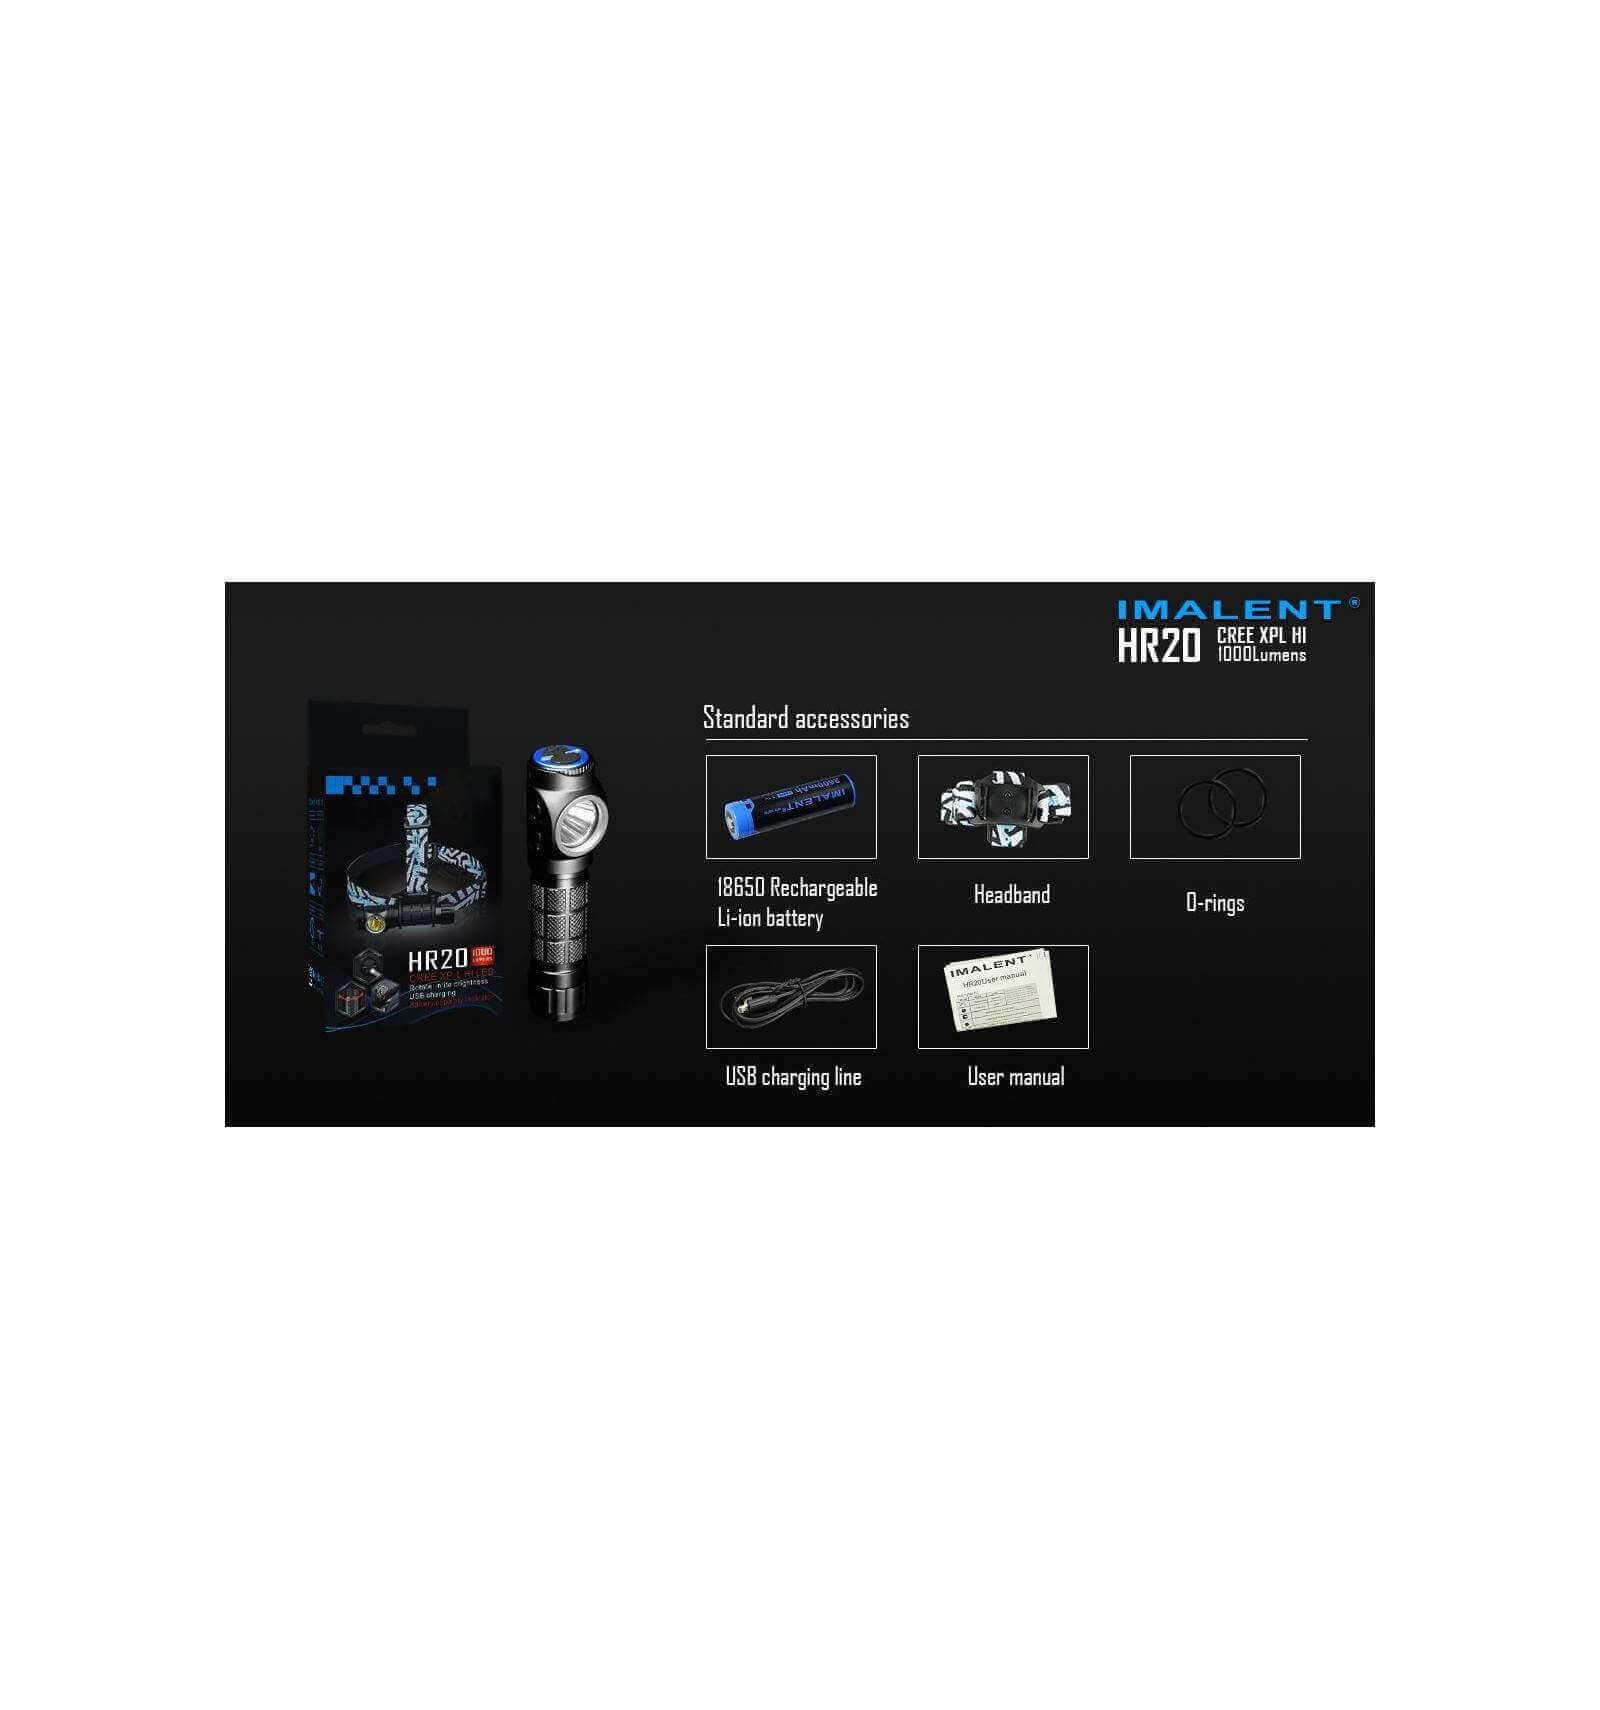 imalent hr20 1000lumen 225m throw for imalent headlamps rh torchsa com DirecTV Hr20 700 Manual DirecTV HD DVR Specs